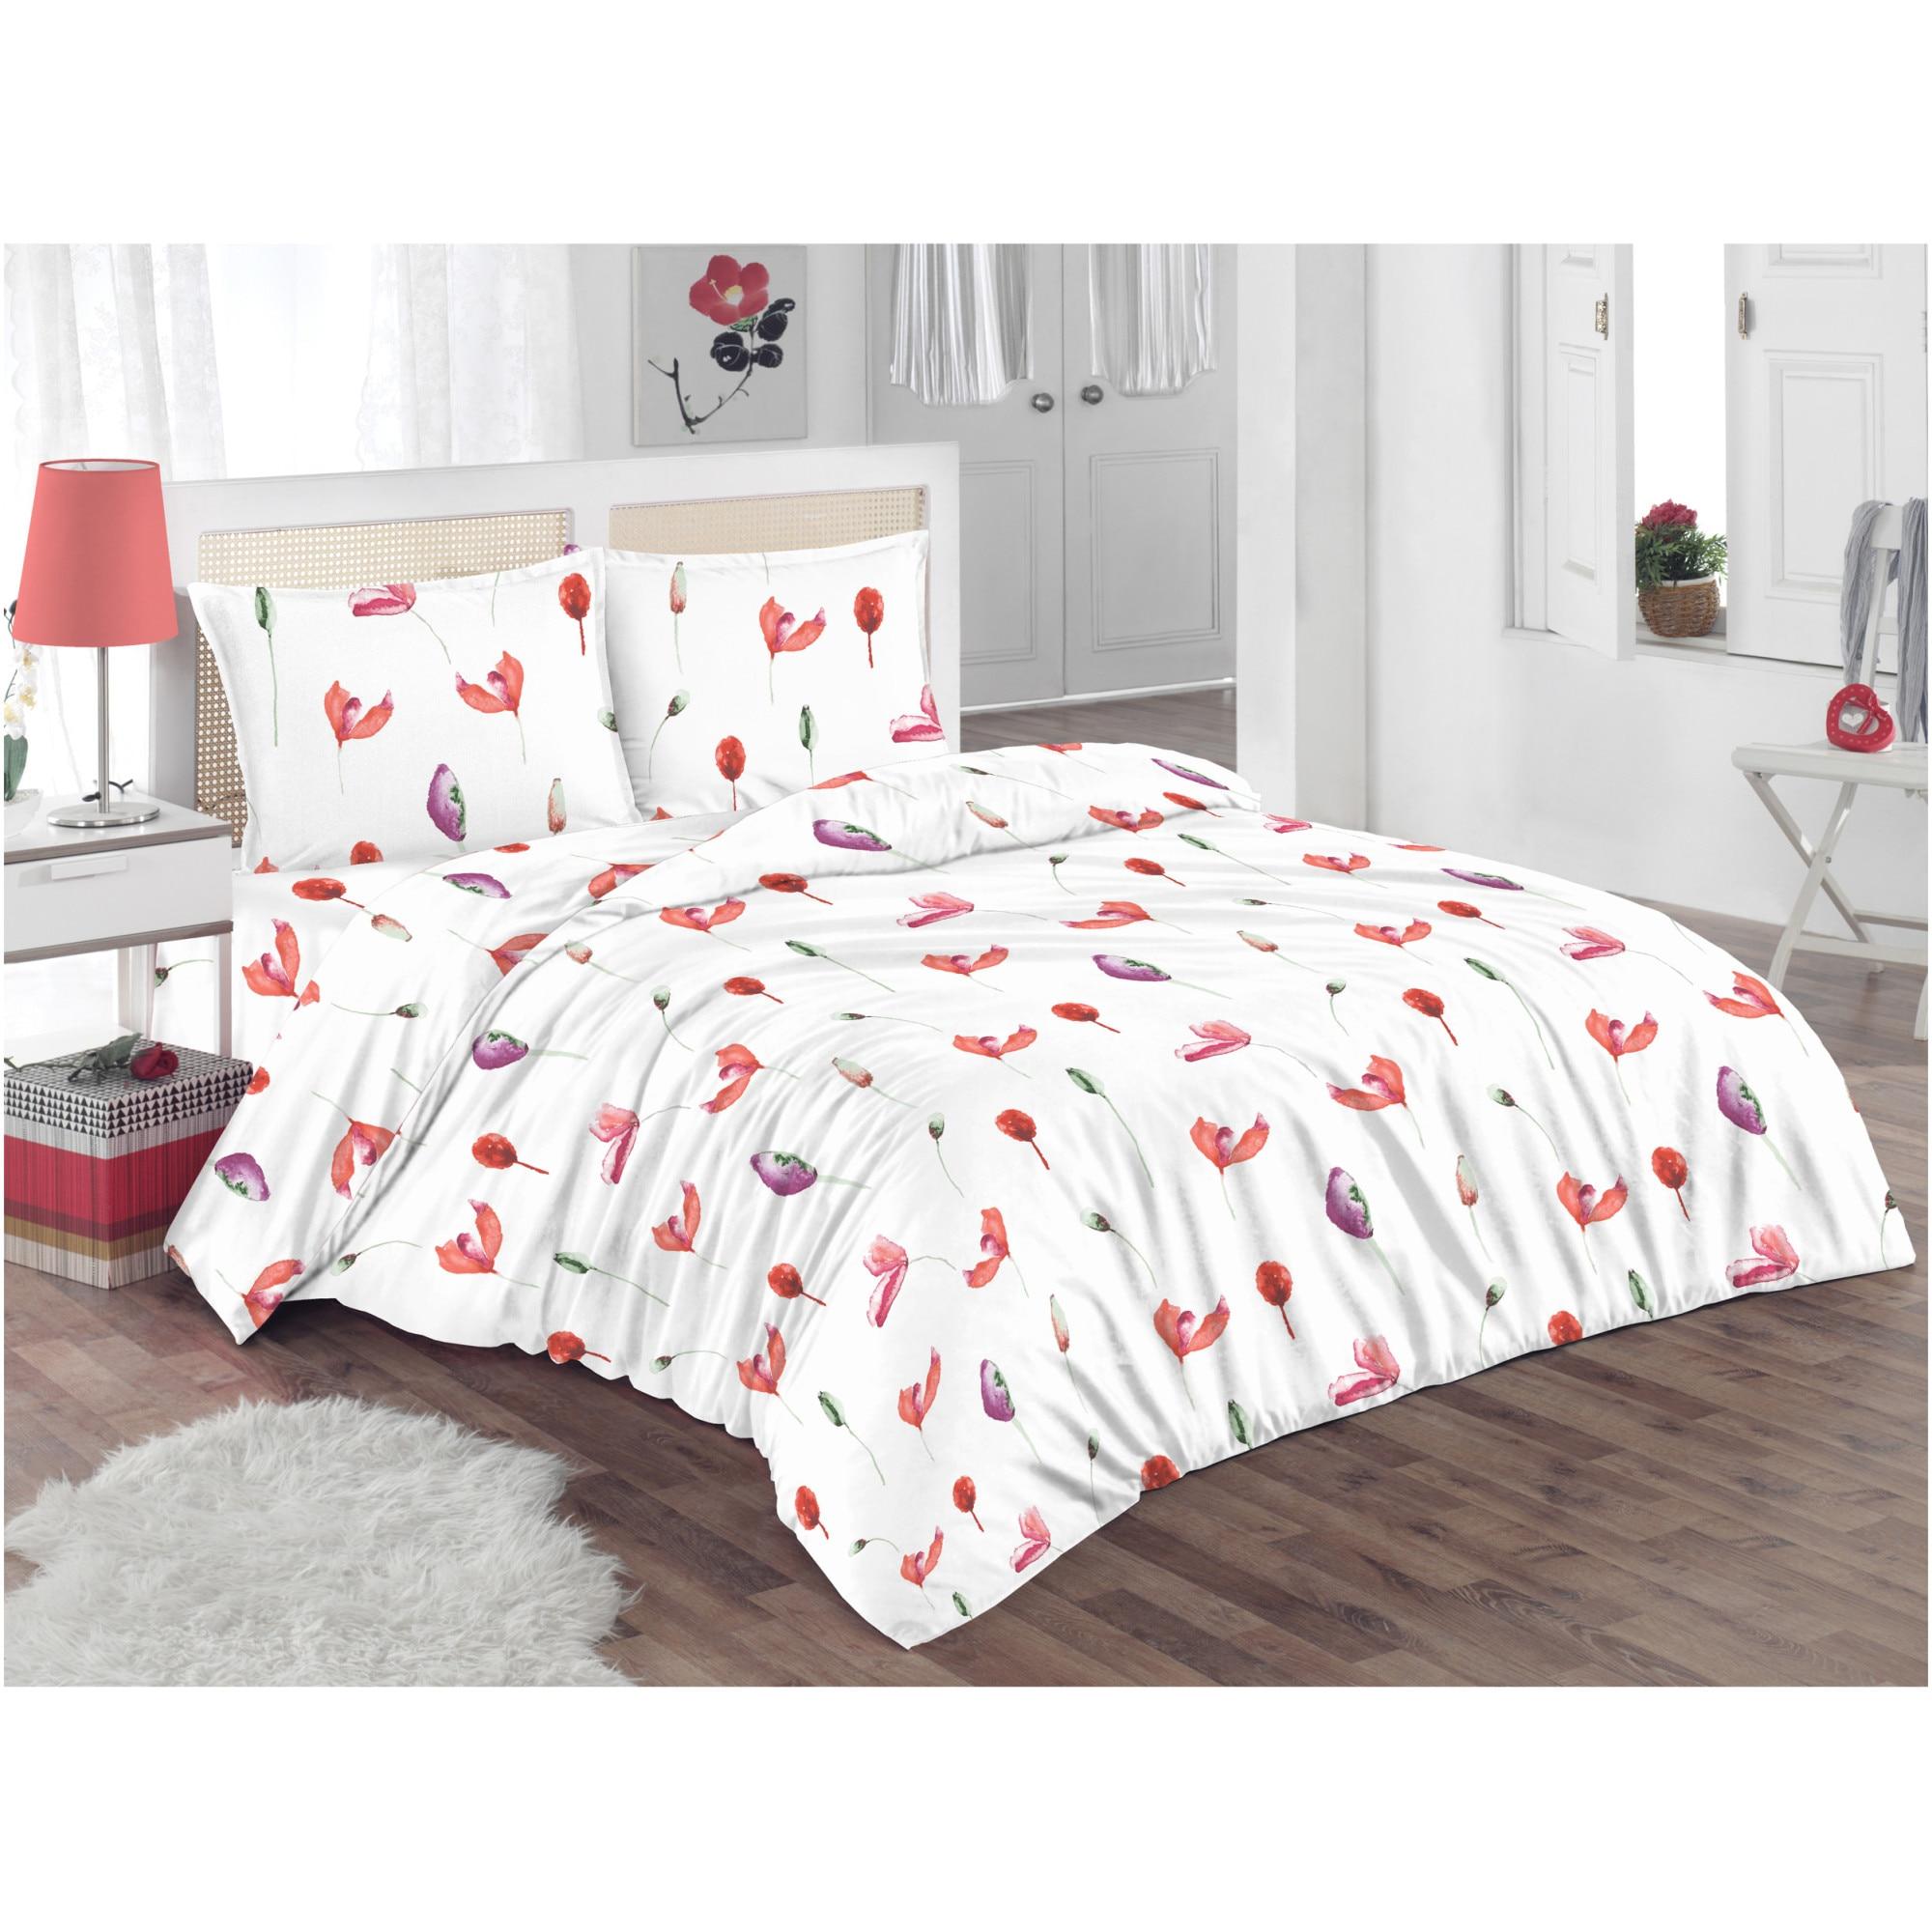 Lenjerie de pat pentru doua persoane Kring Poppy